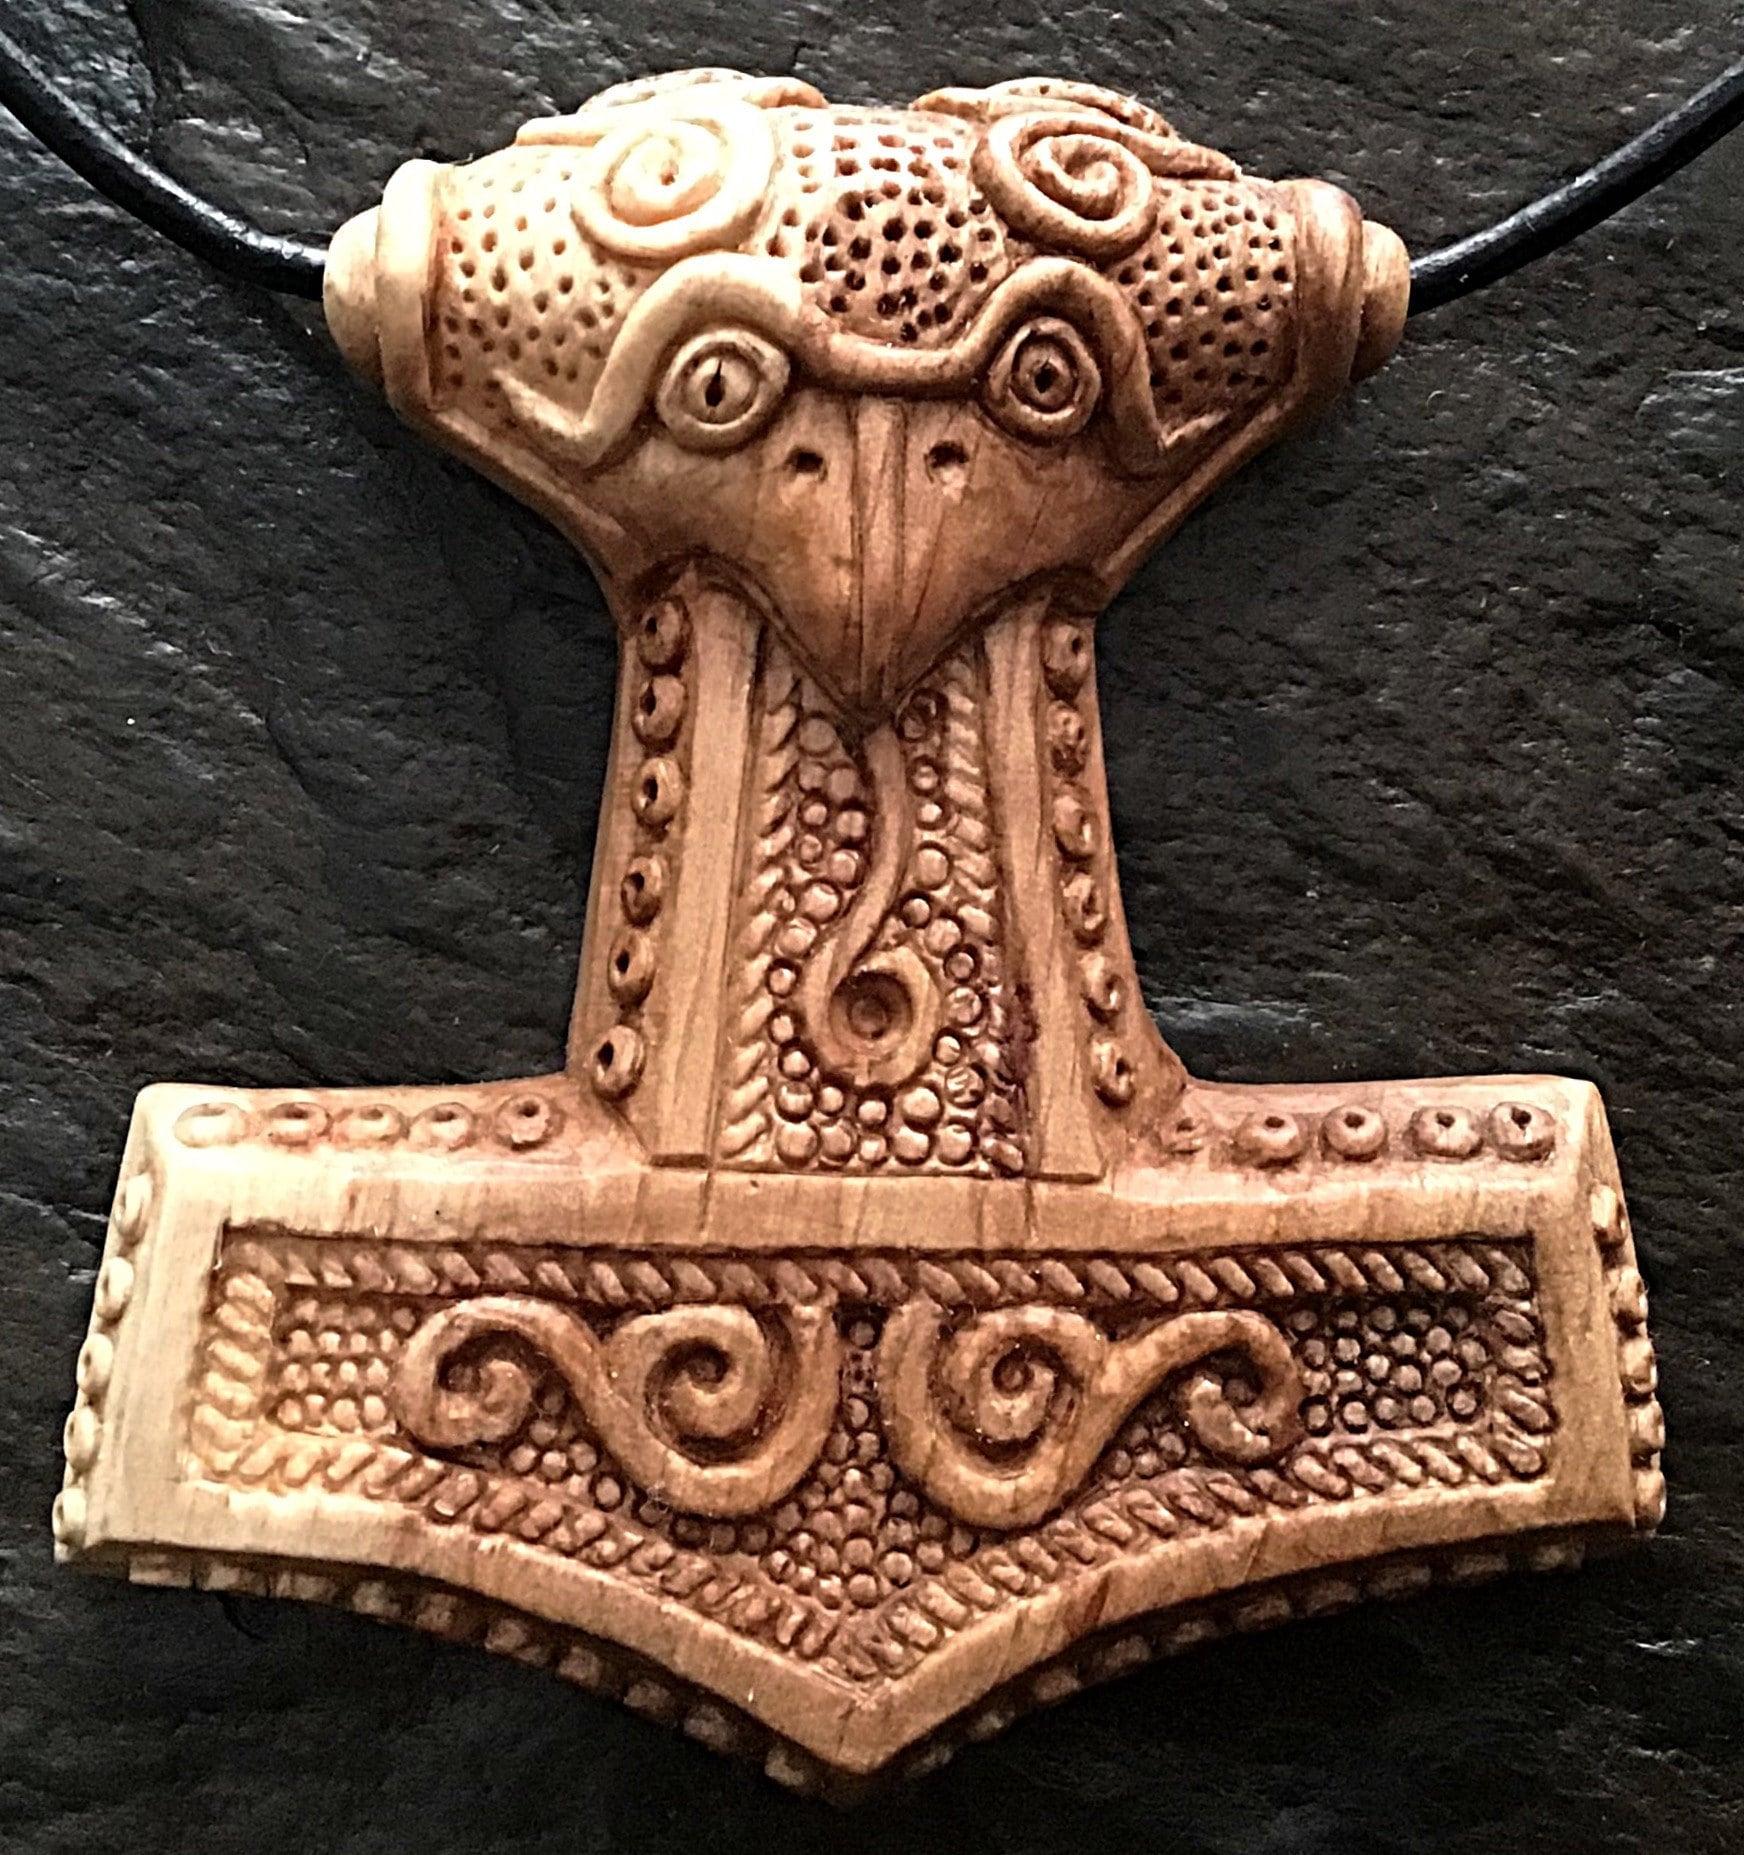 Paul's interpretation of the Skane Thor's Hammer